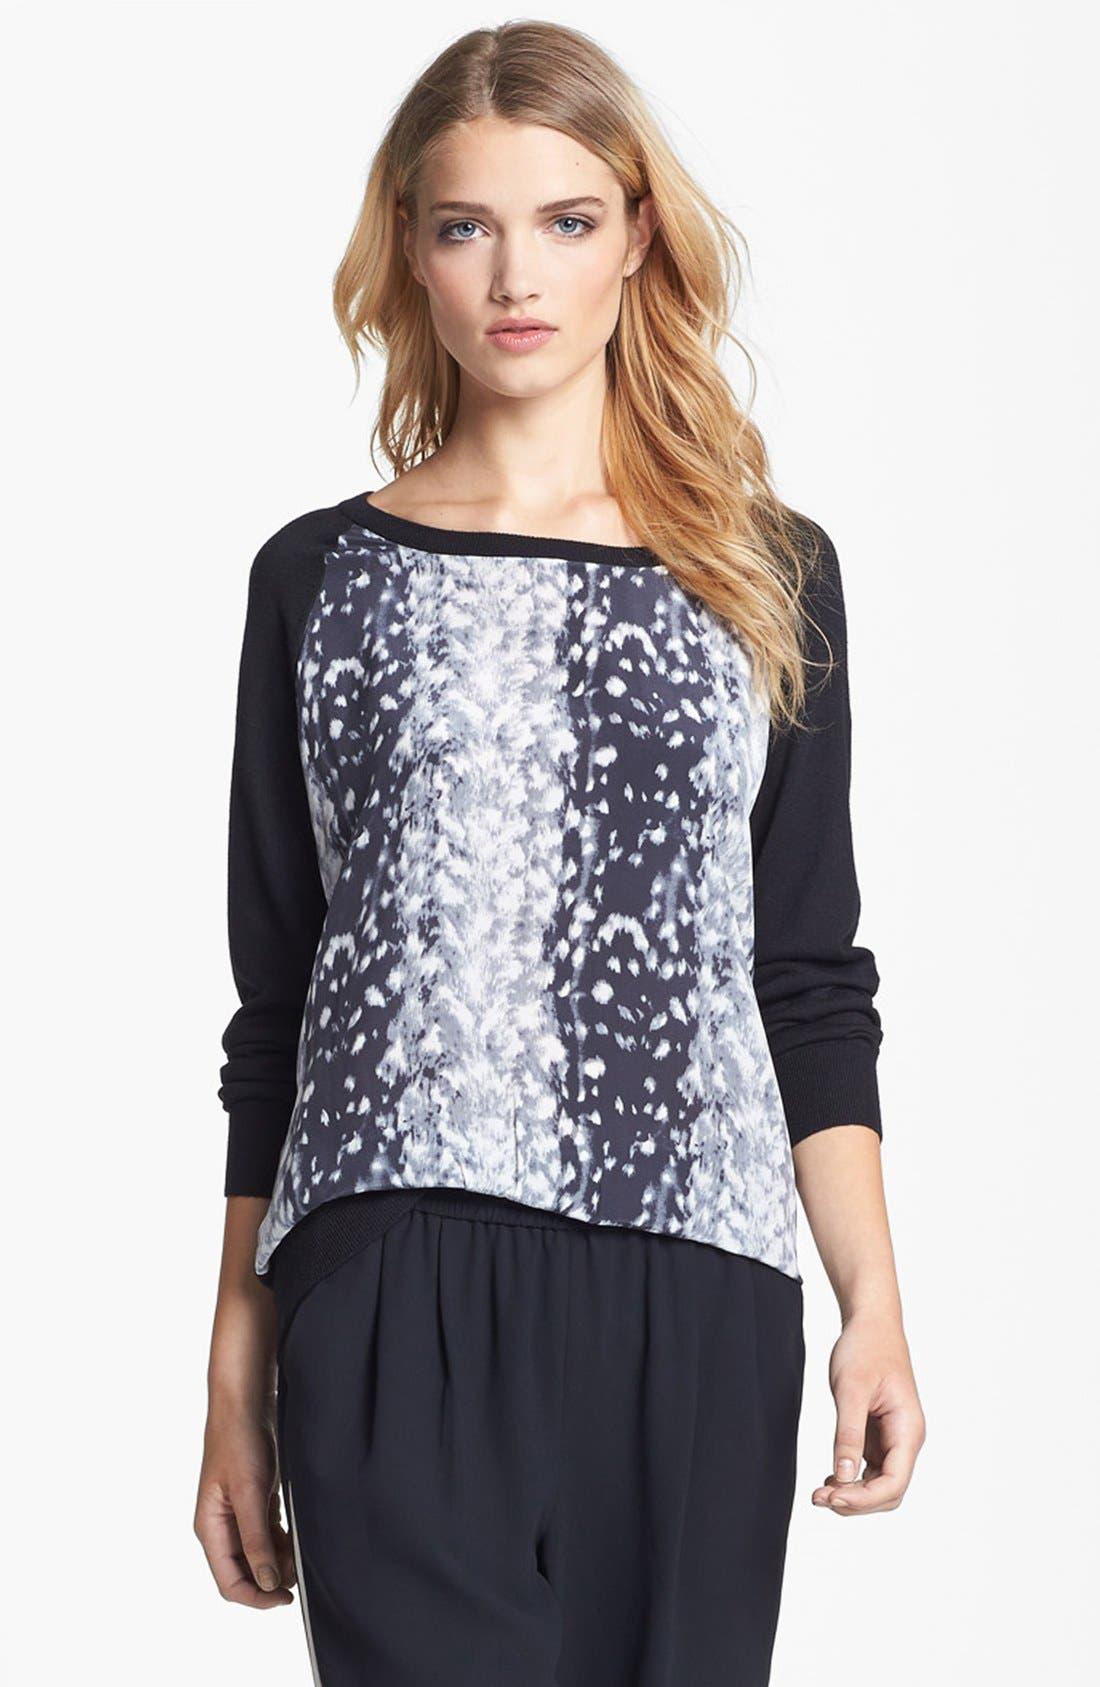 'Malena B.' Mixed Media Sweater,                             Alternate thumbnail 6, color,                             001